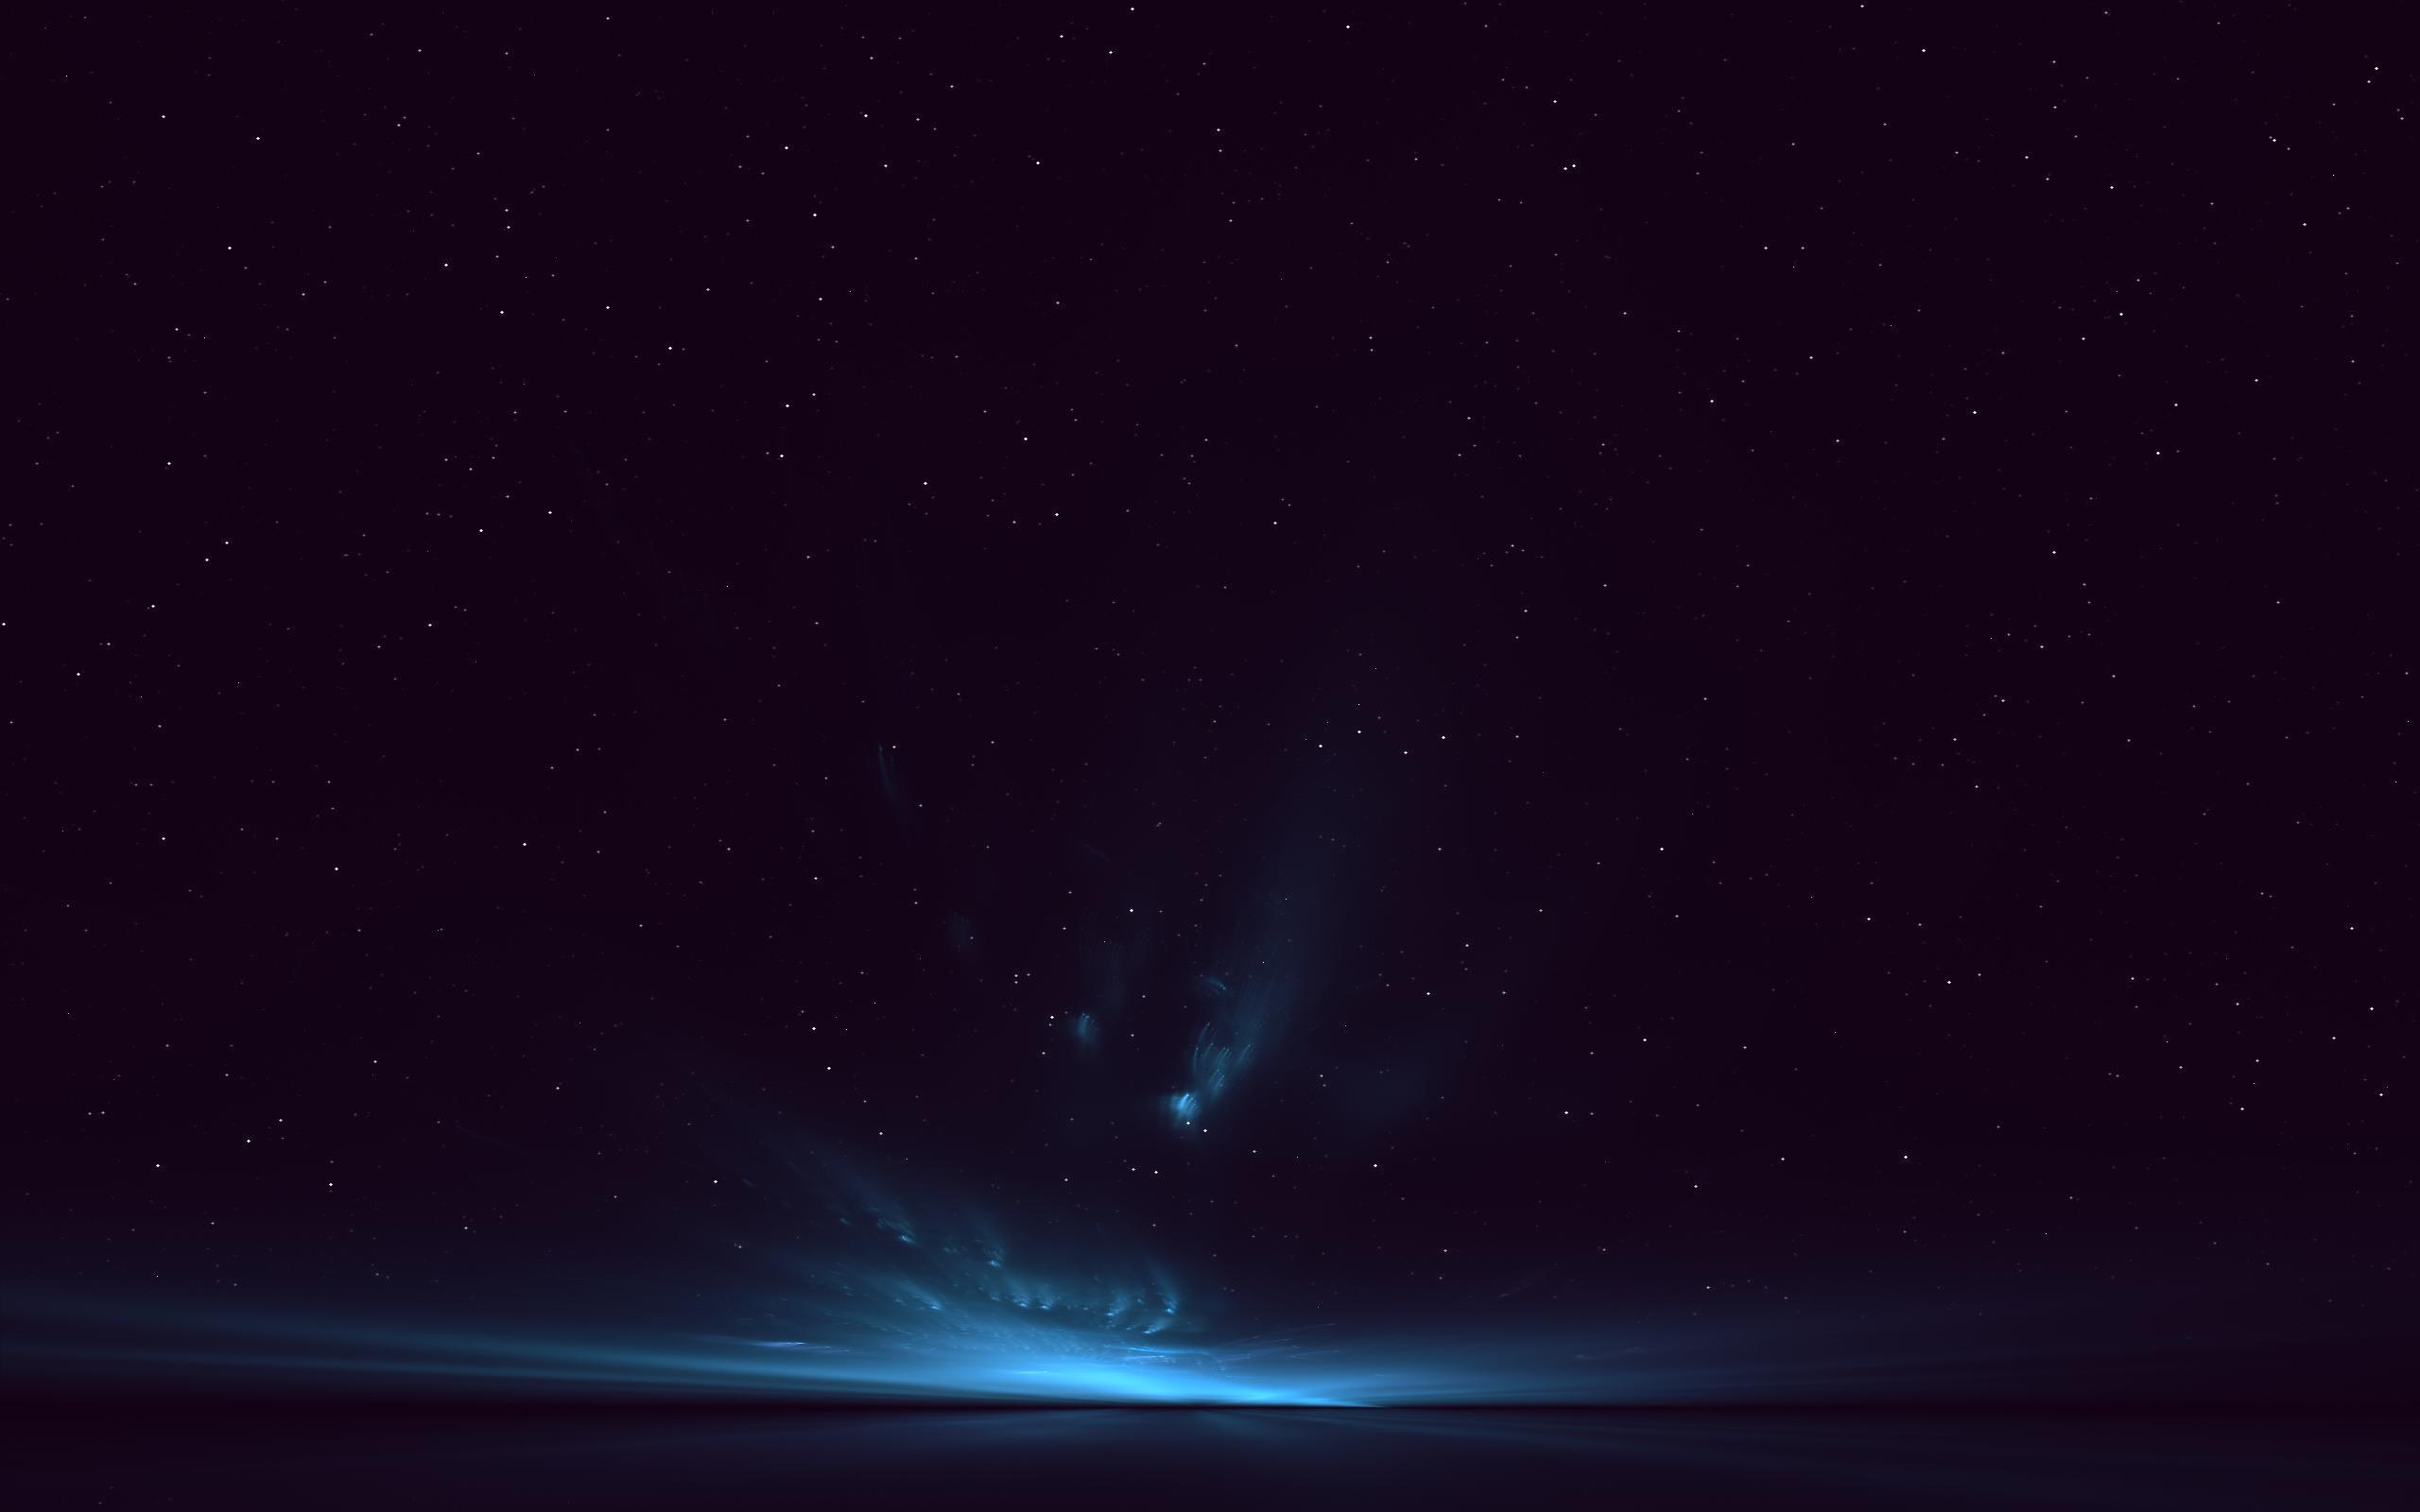 General 2560x1600 space dark blue dark blue stars aurorae black sky landscape space art digital art